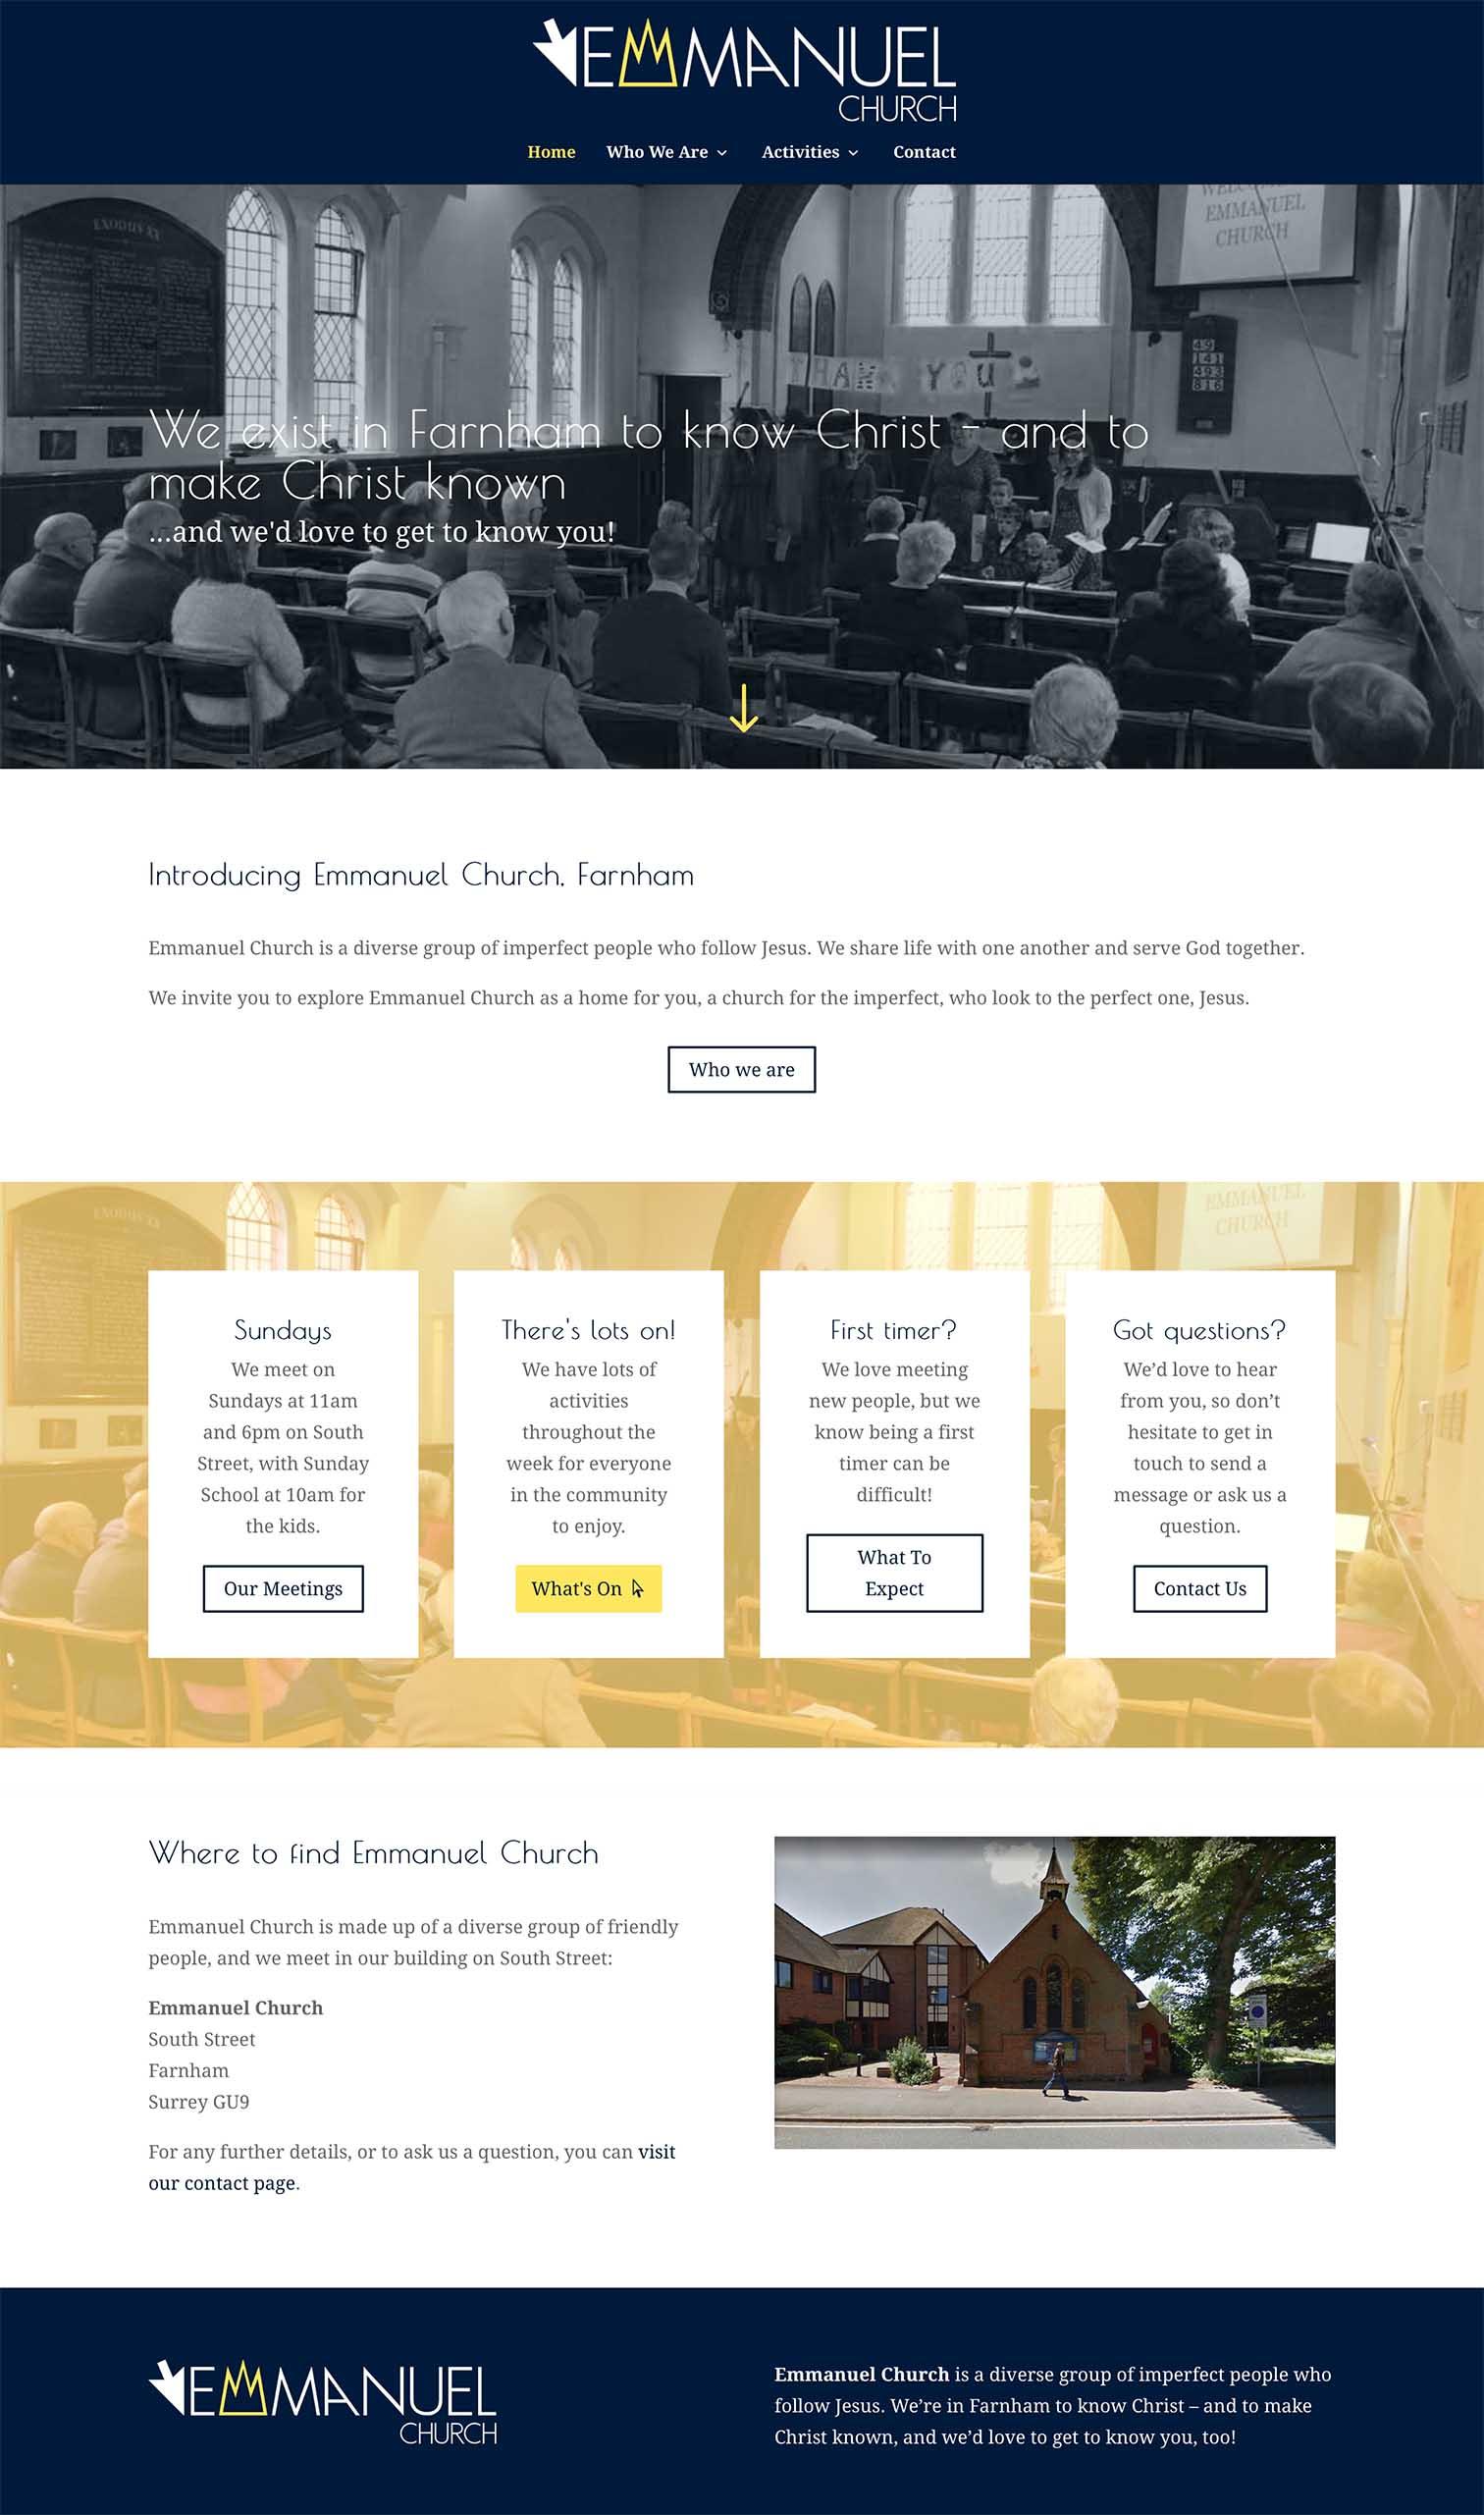 Emmanuel UK Church Website Design built by Be Gallant